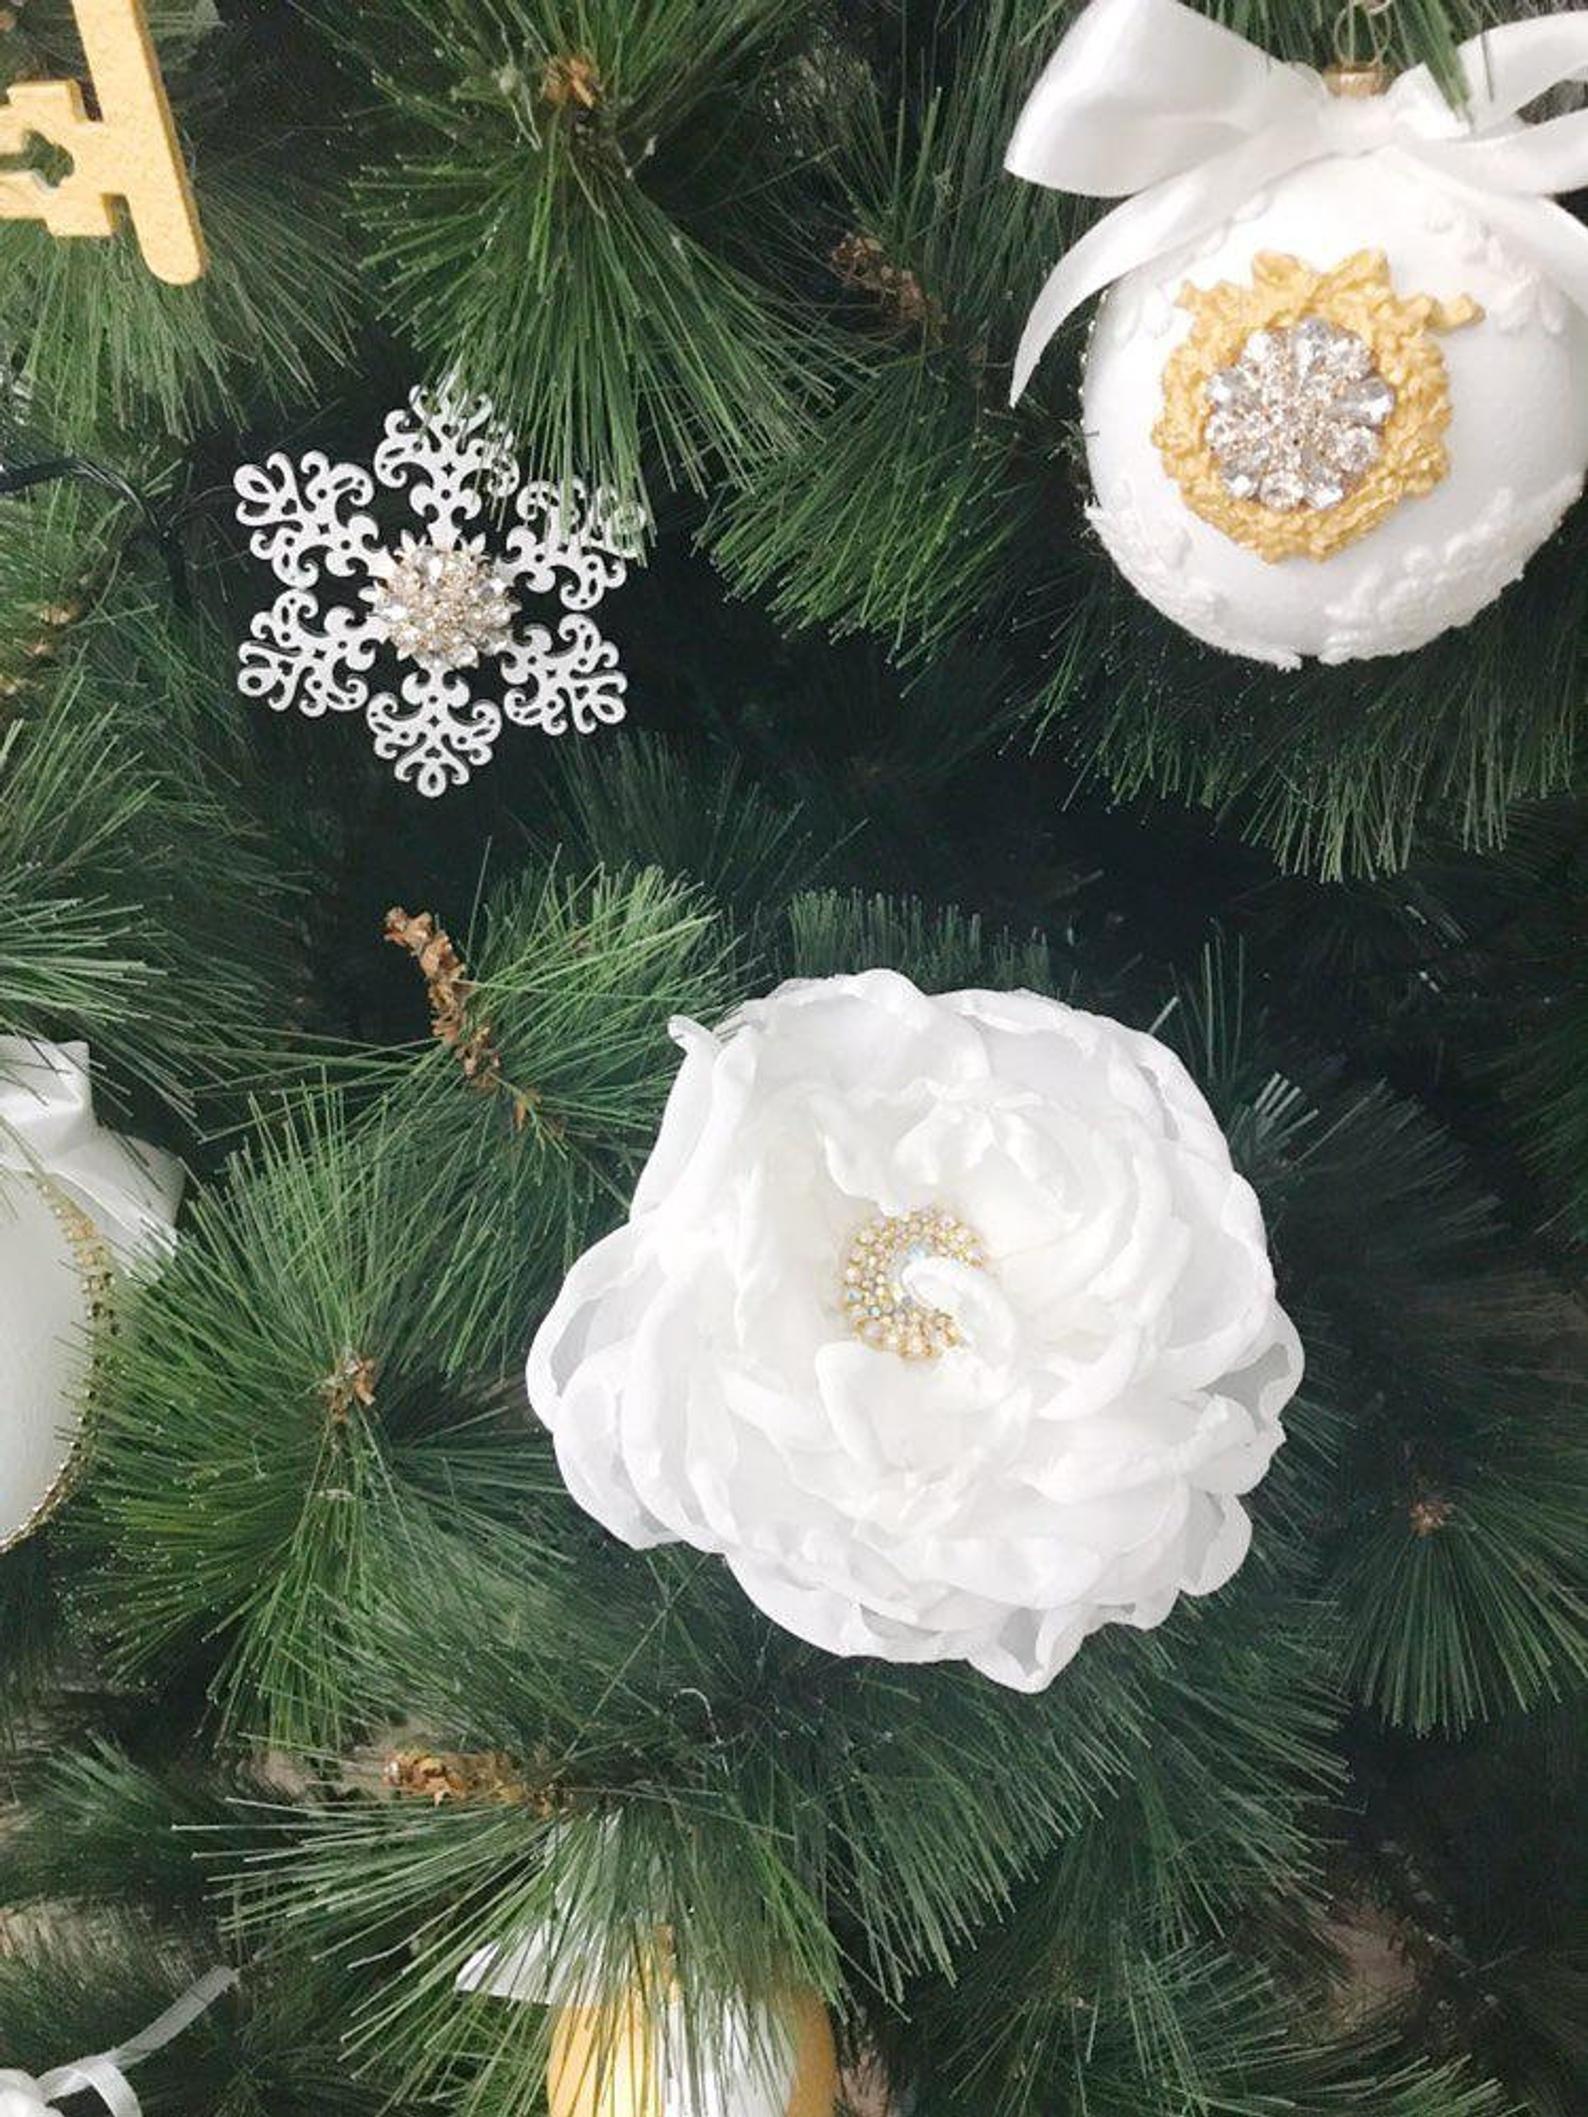 White Christmas Ornaments Set Christmas Tree Ornaments Etsy White Christmas Ornaments Christmas Ornaments Elegant Christmas Trees